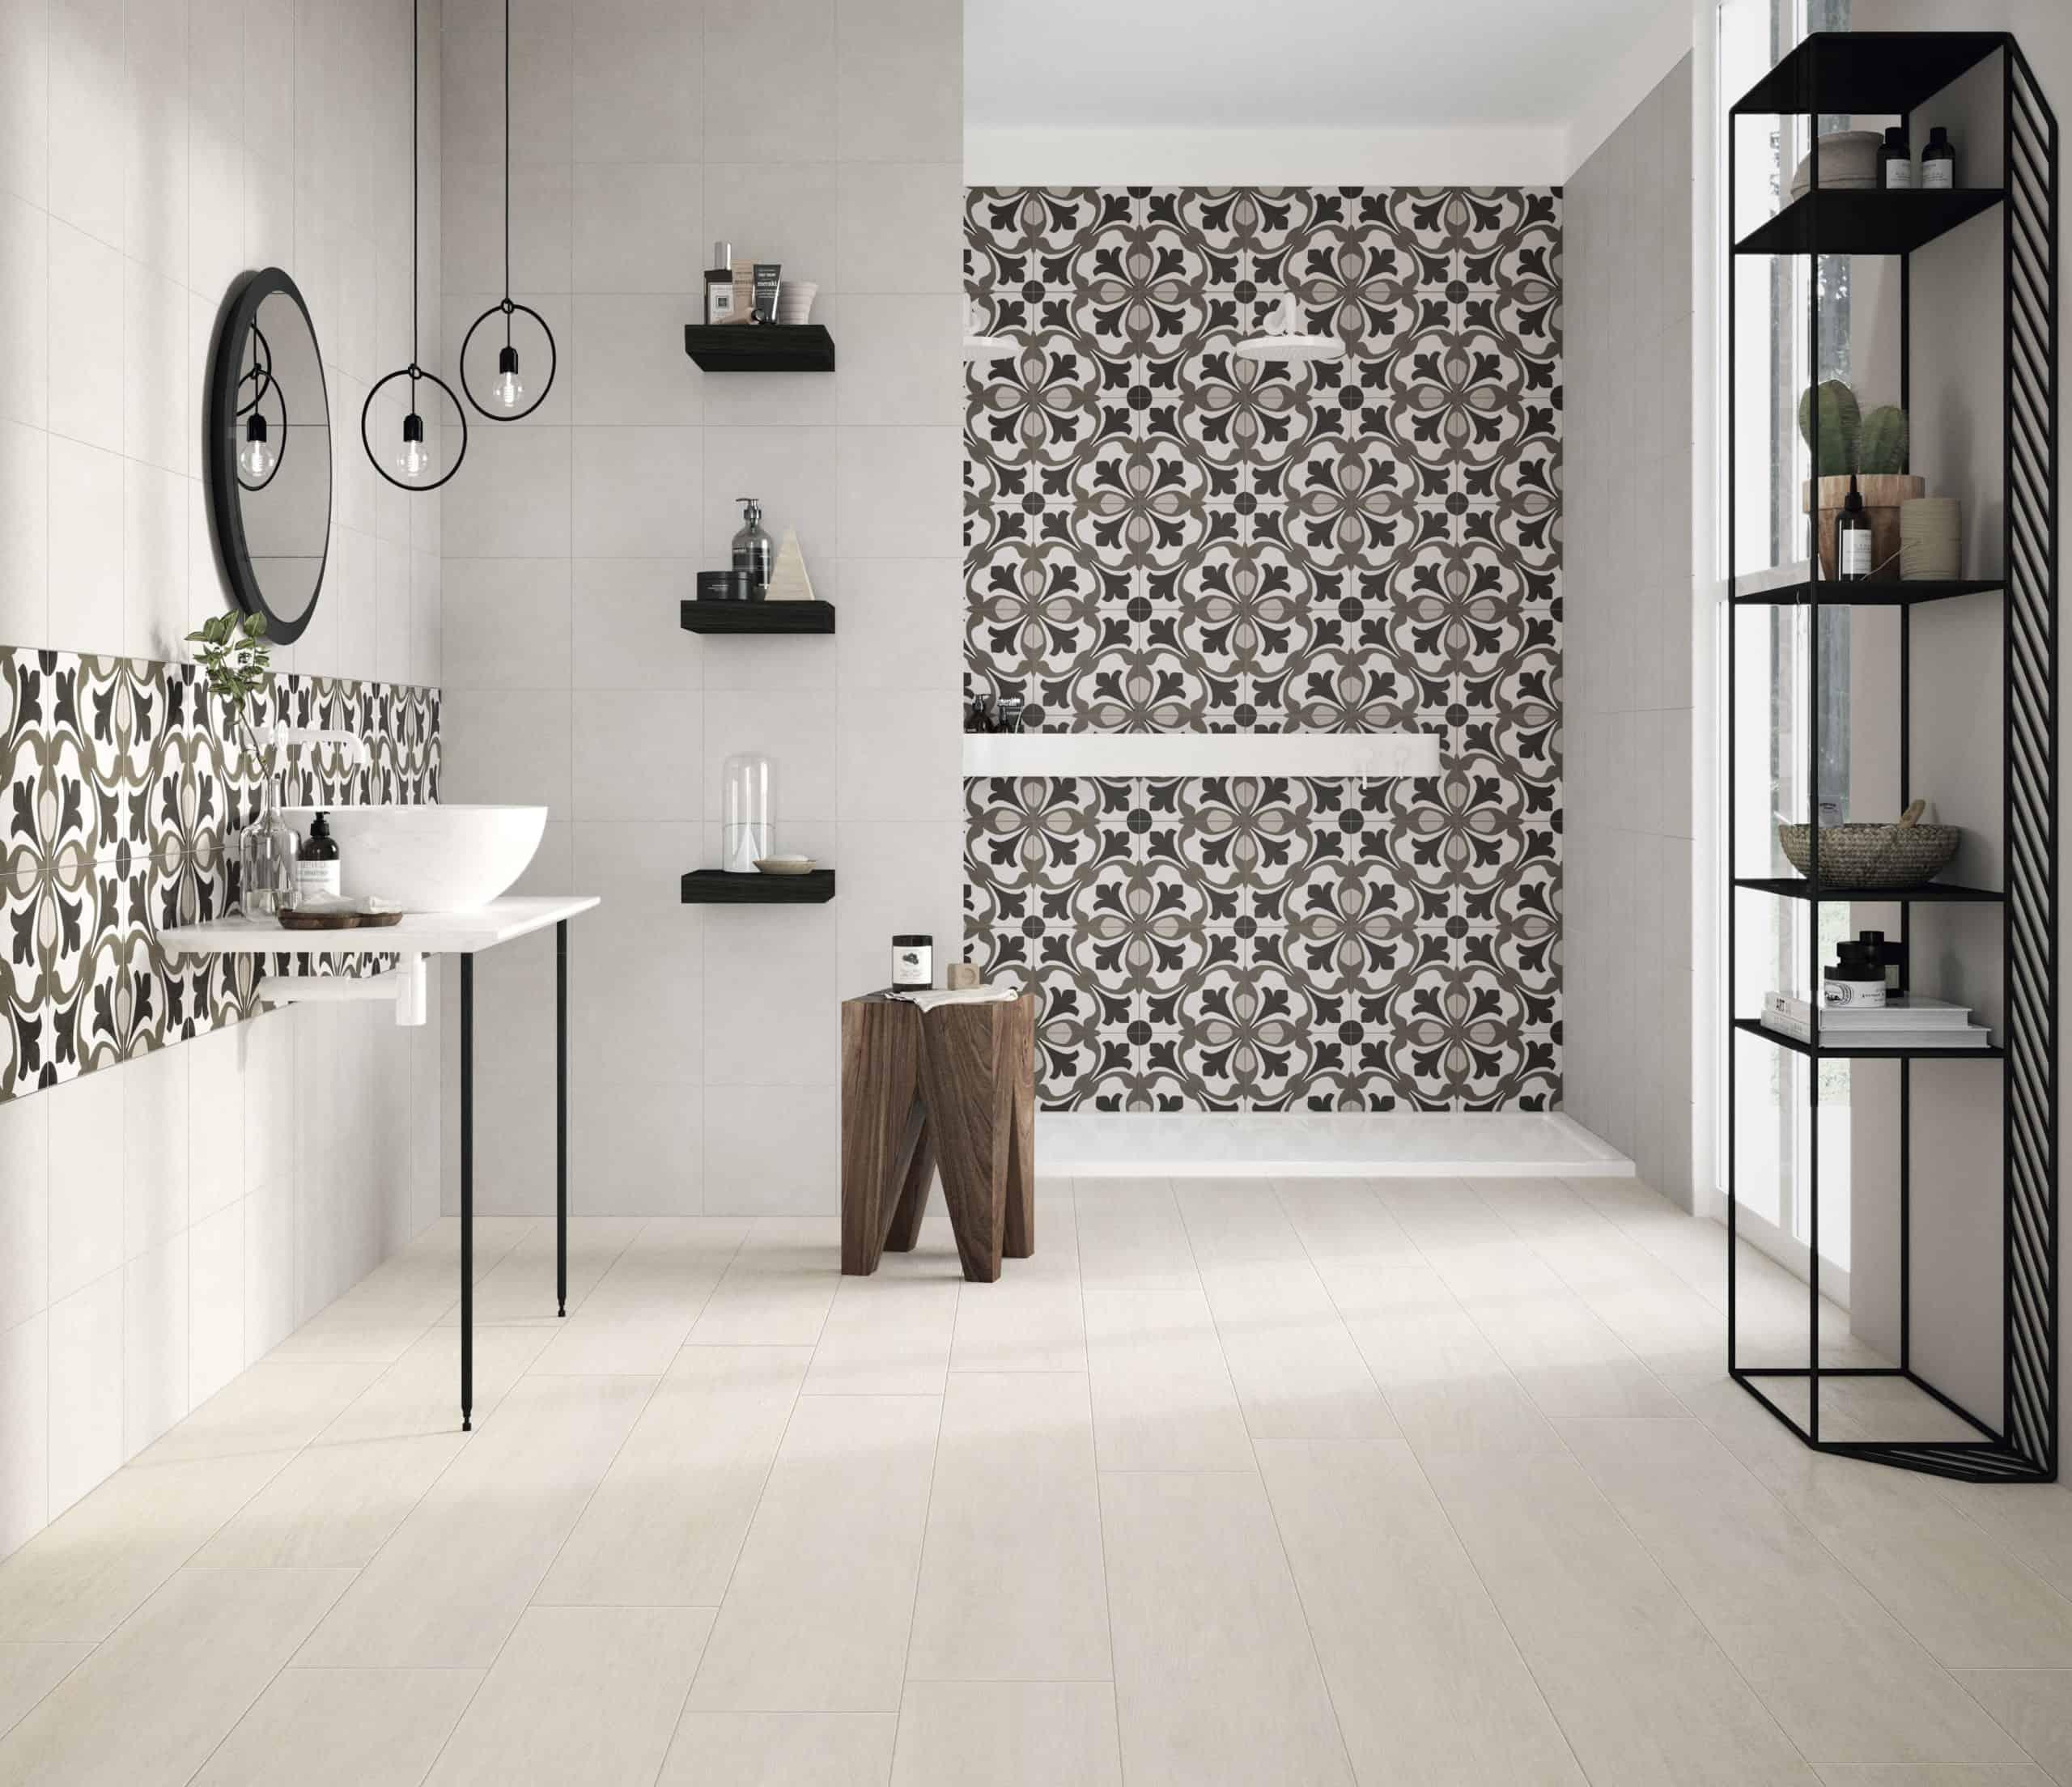 emc tiles pattern tiles floor and wall bathroom kitchen hallway flooring